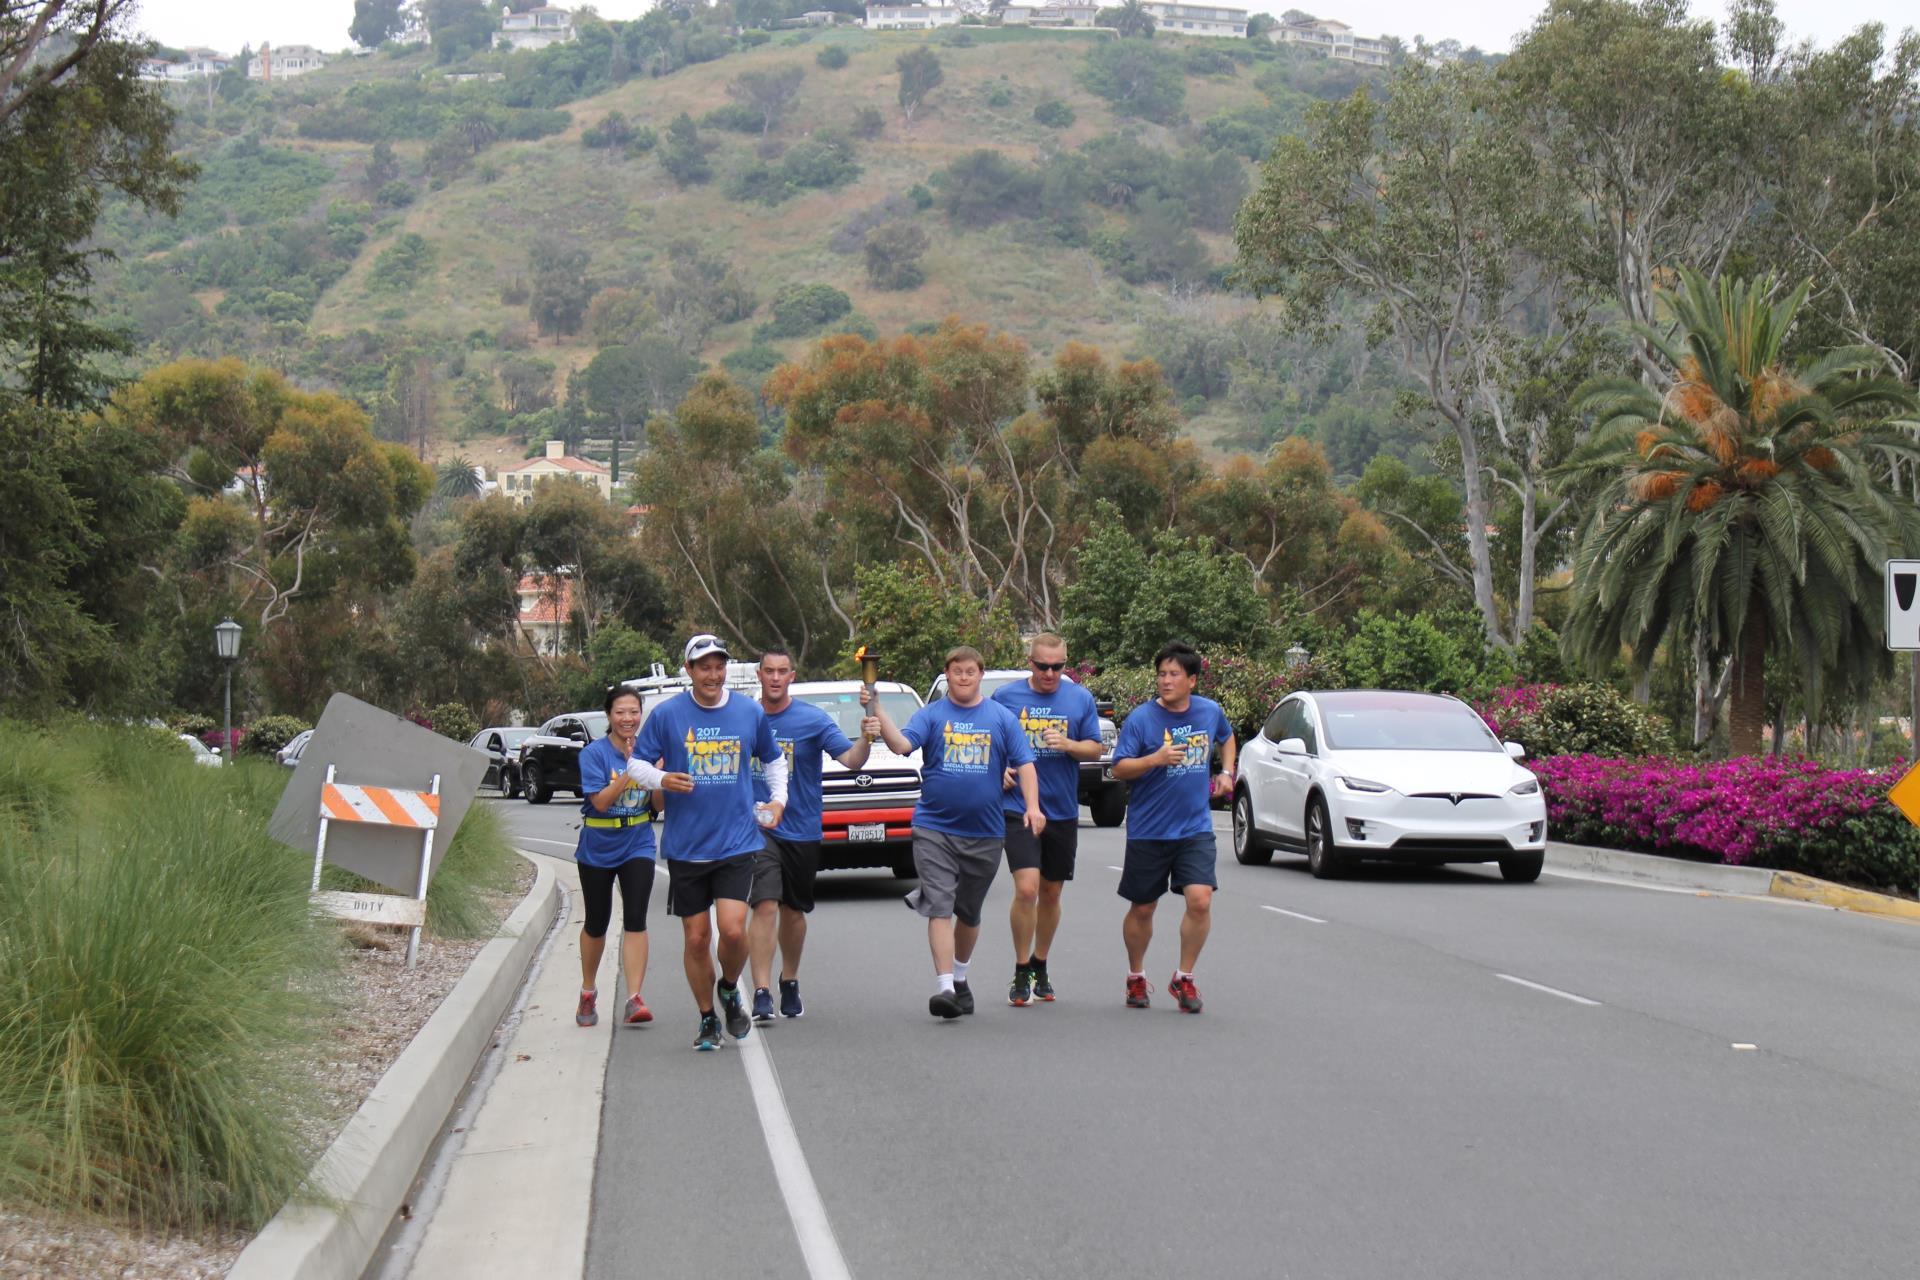 Runners coming up Palos Verdes Drive West to Palos Verdes Boulevard